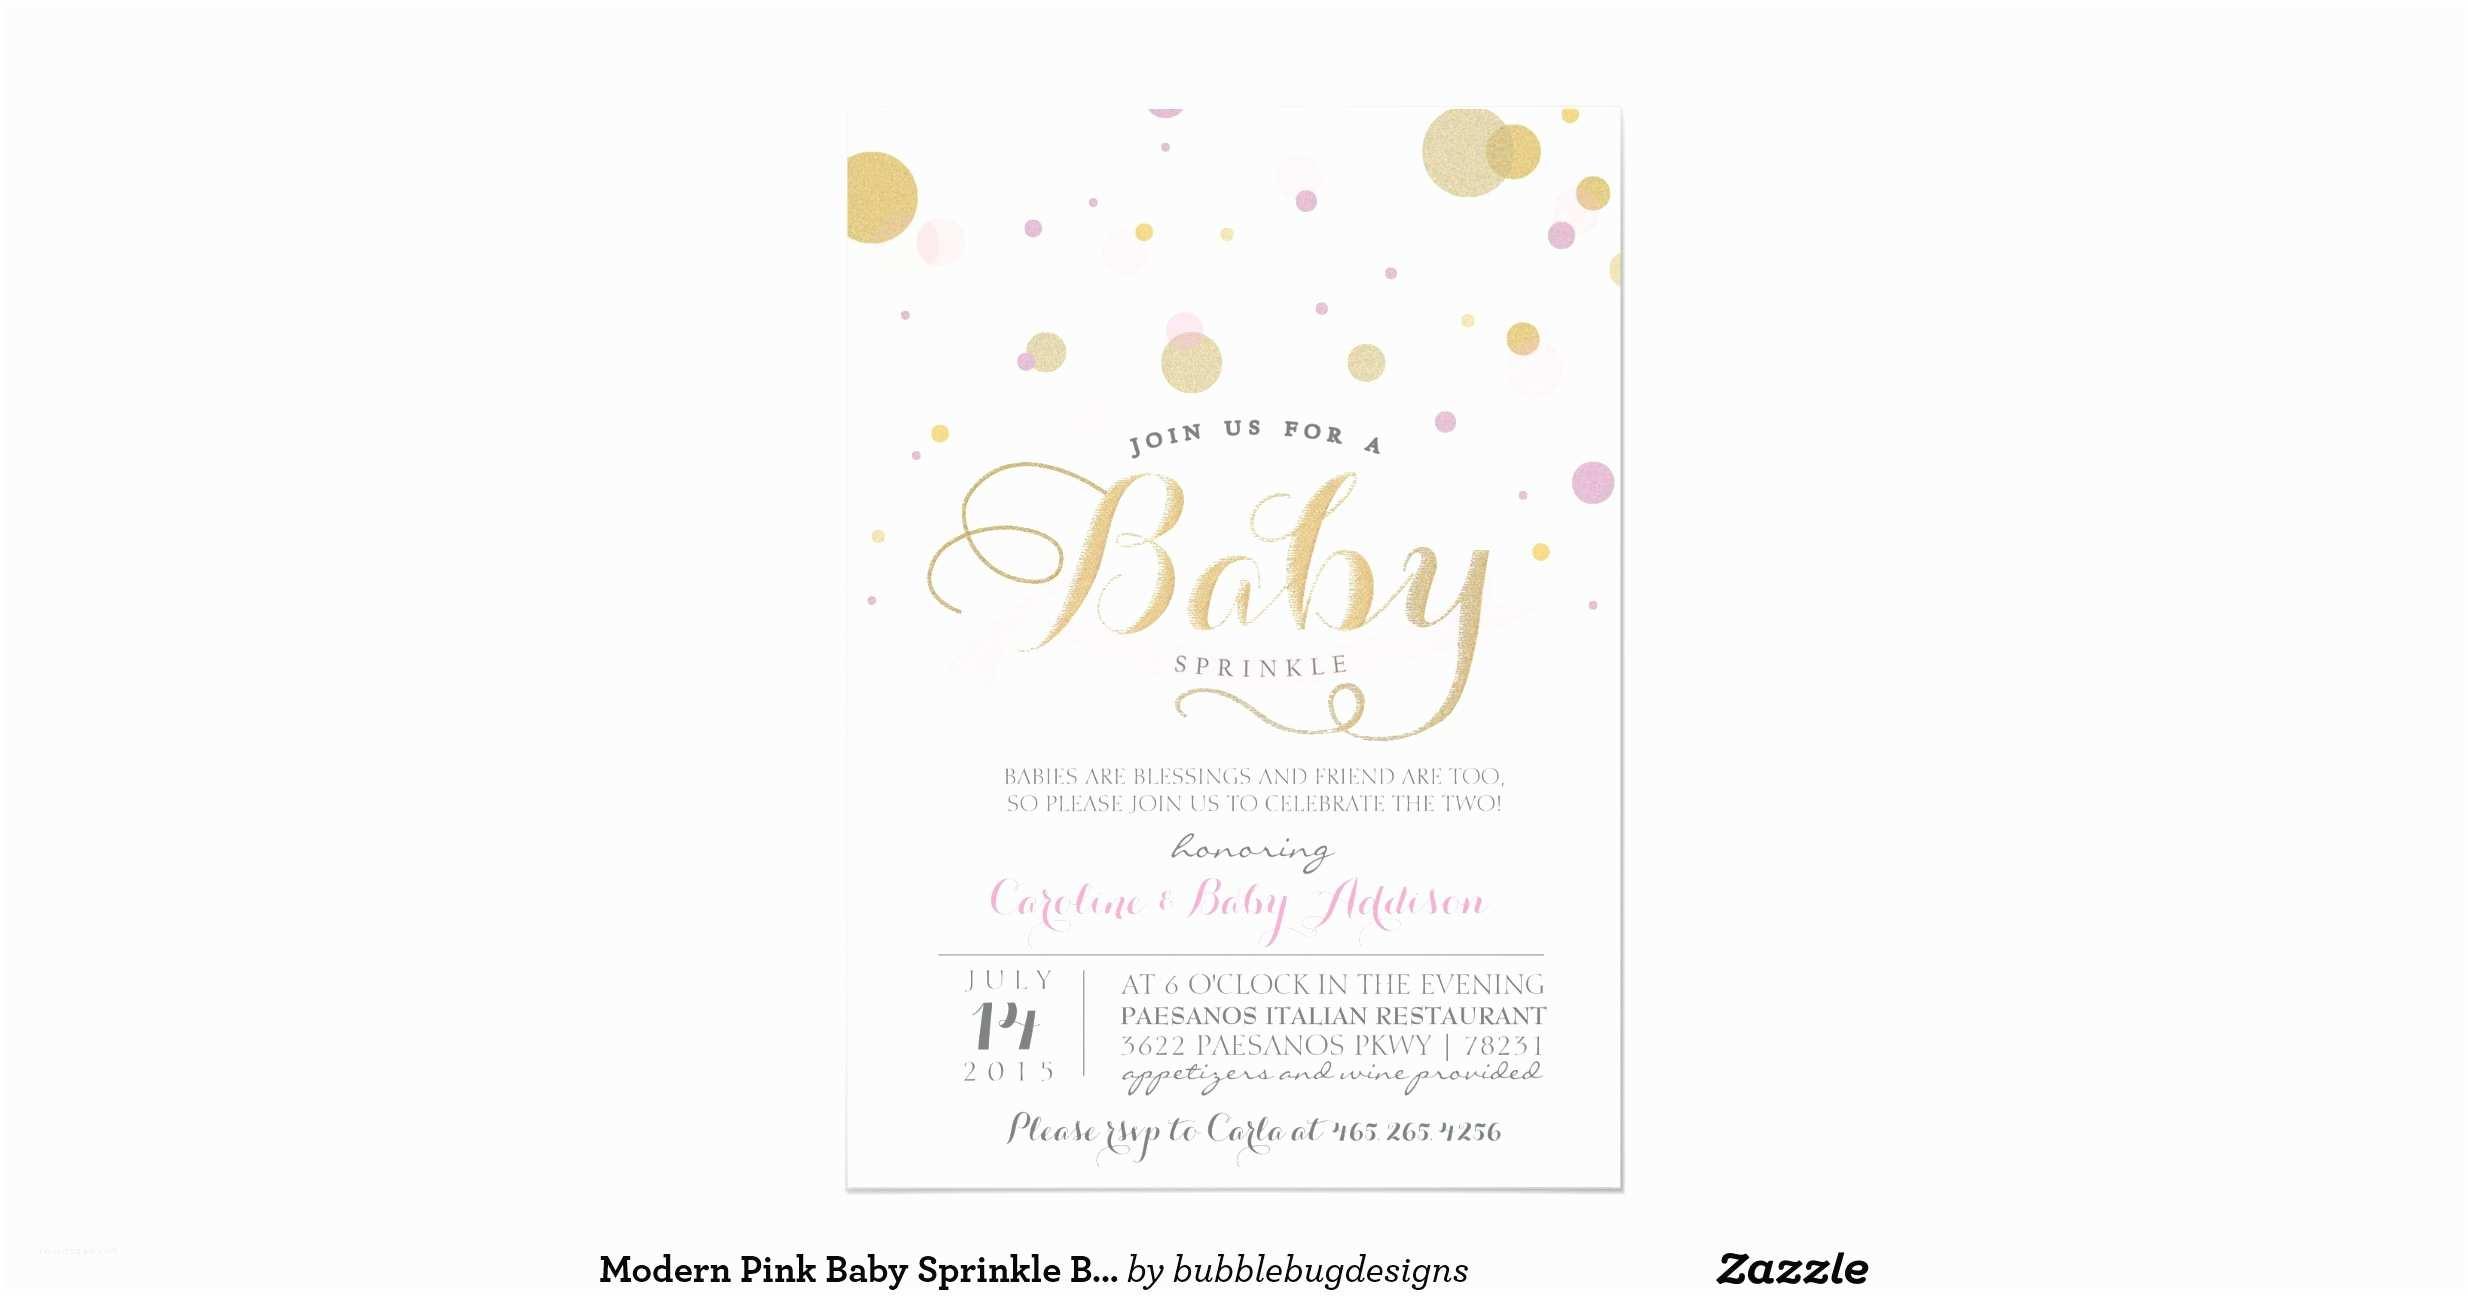 Modern Baby Shower Invitations Modern Pink Baby Sprinkle Baby Shower Invitation